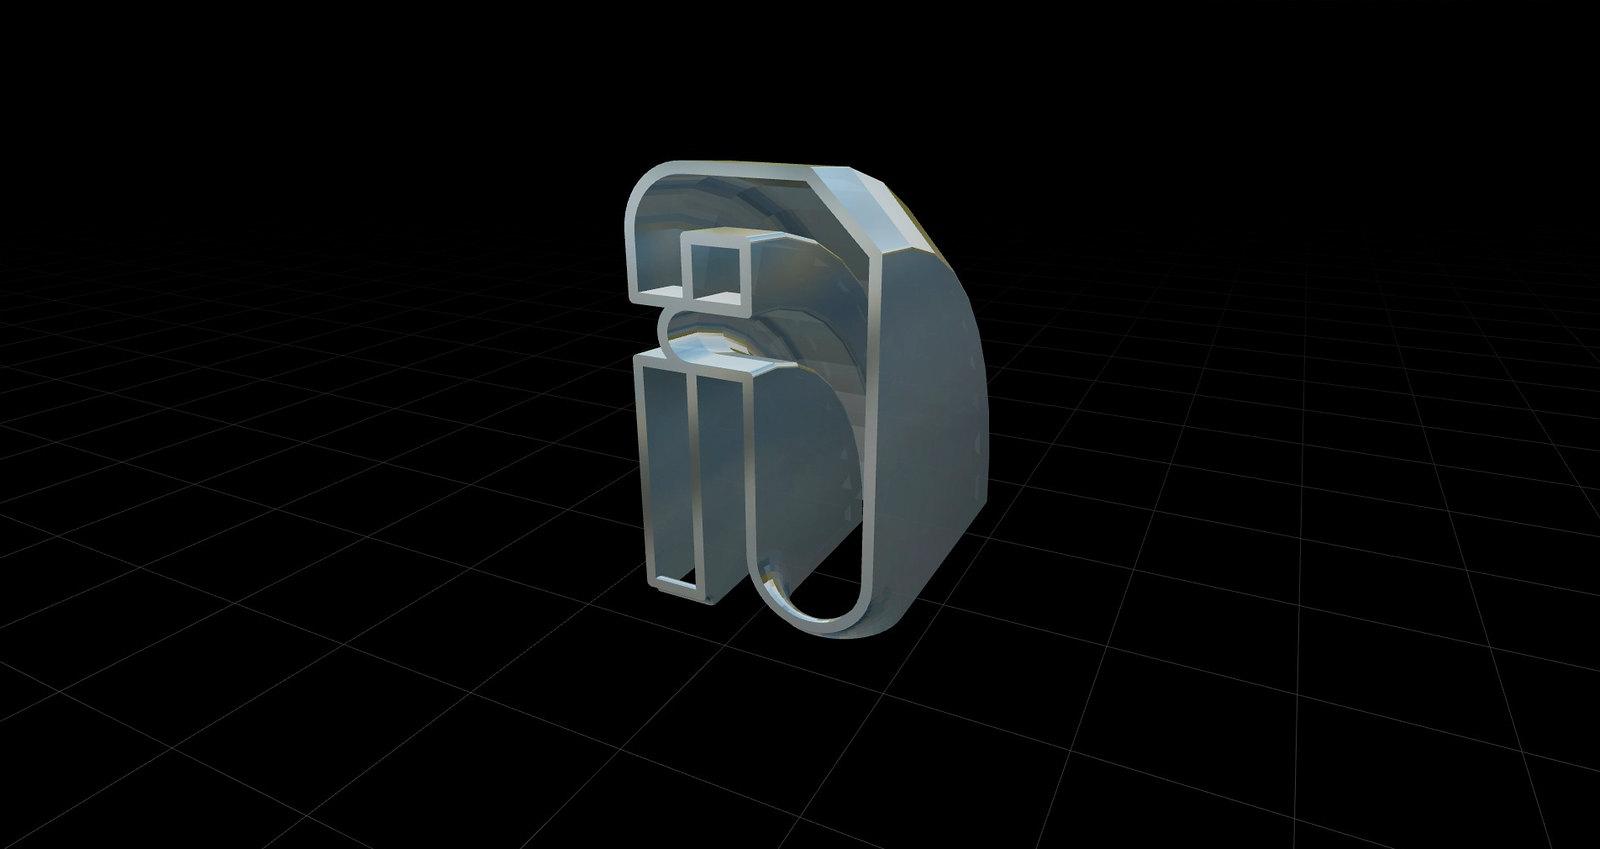 Gramapoética-Caracteres tipográficos 3D letra A-a-variaciones